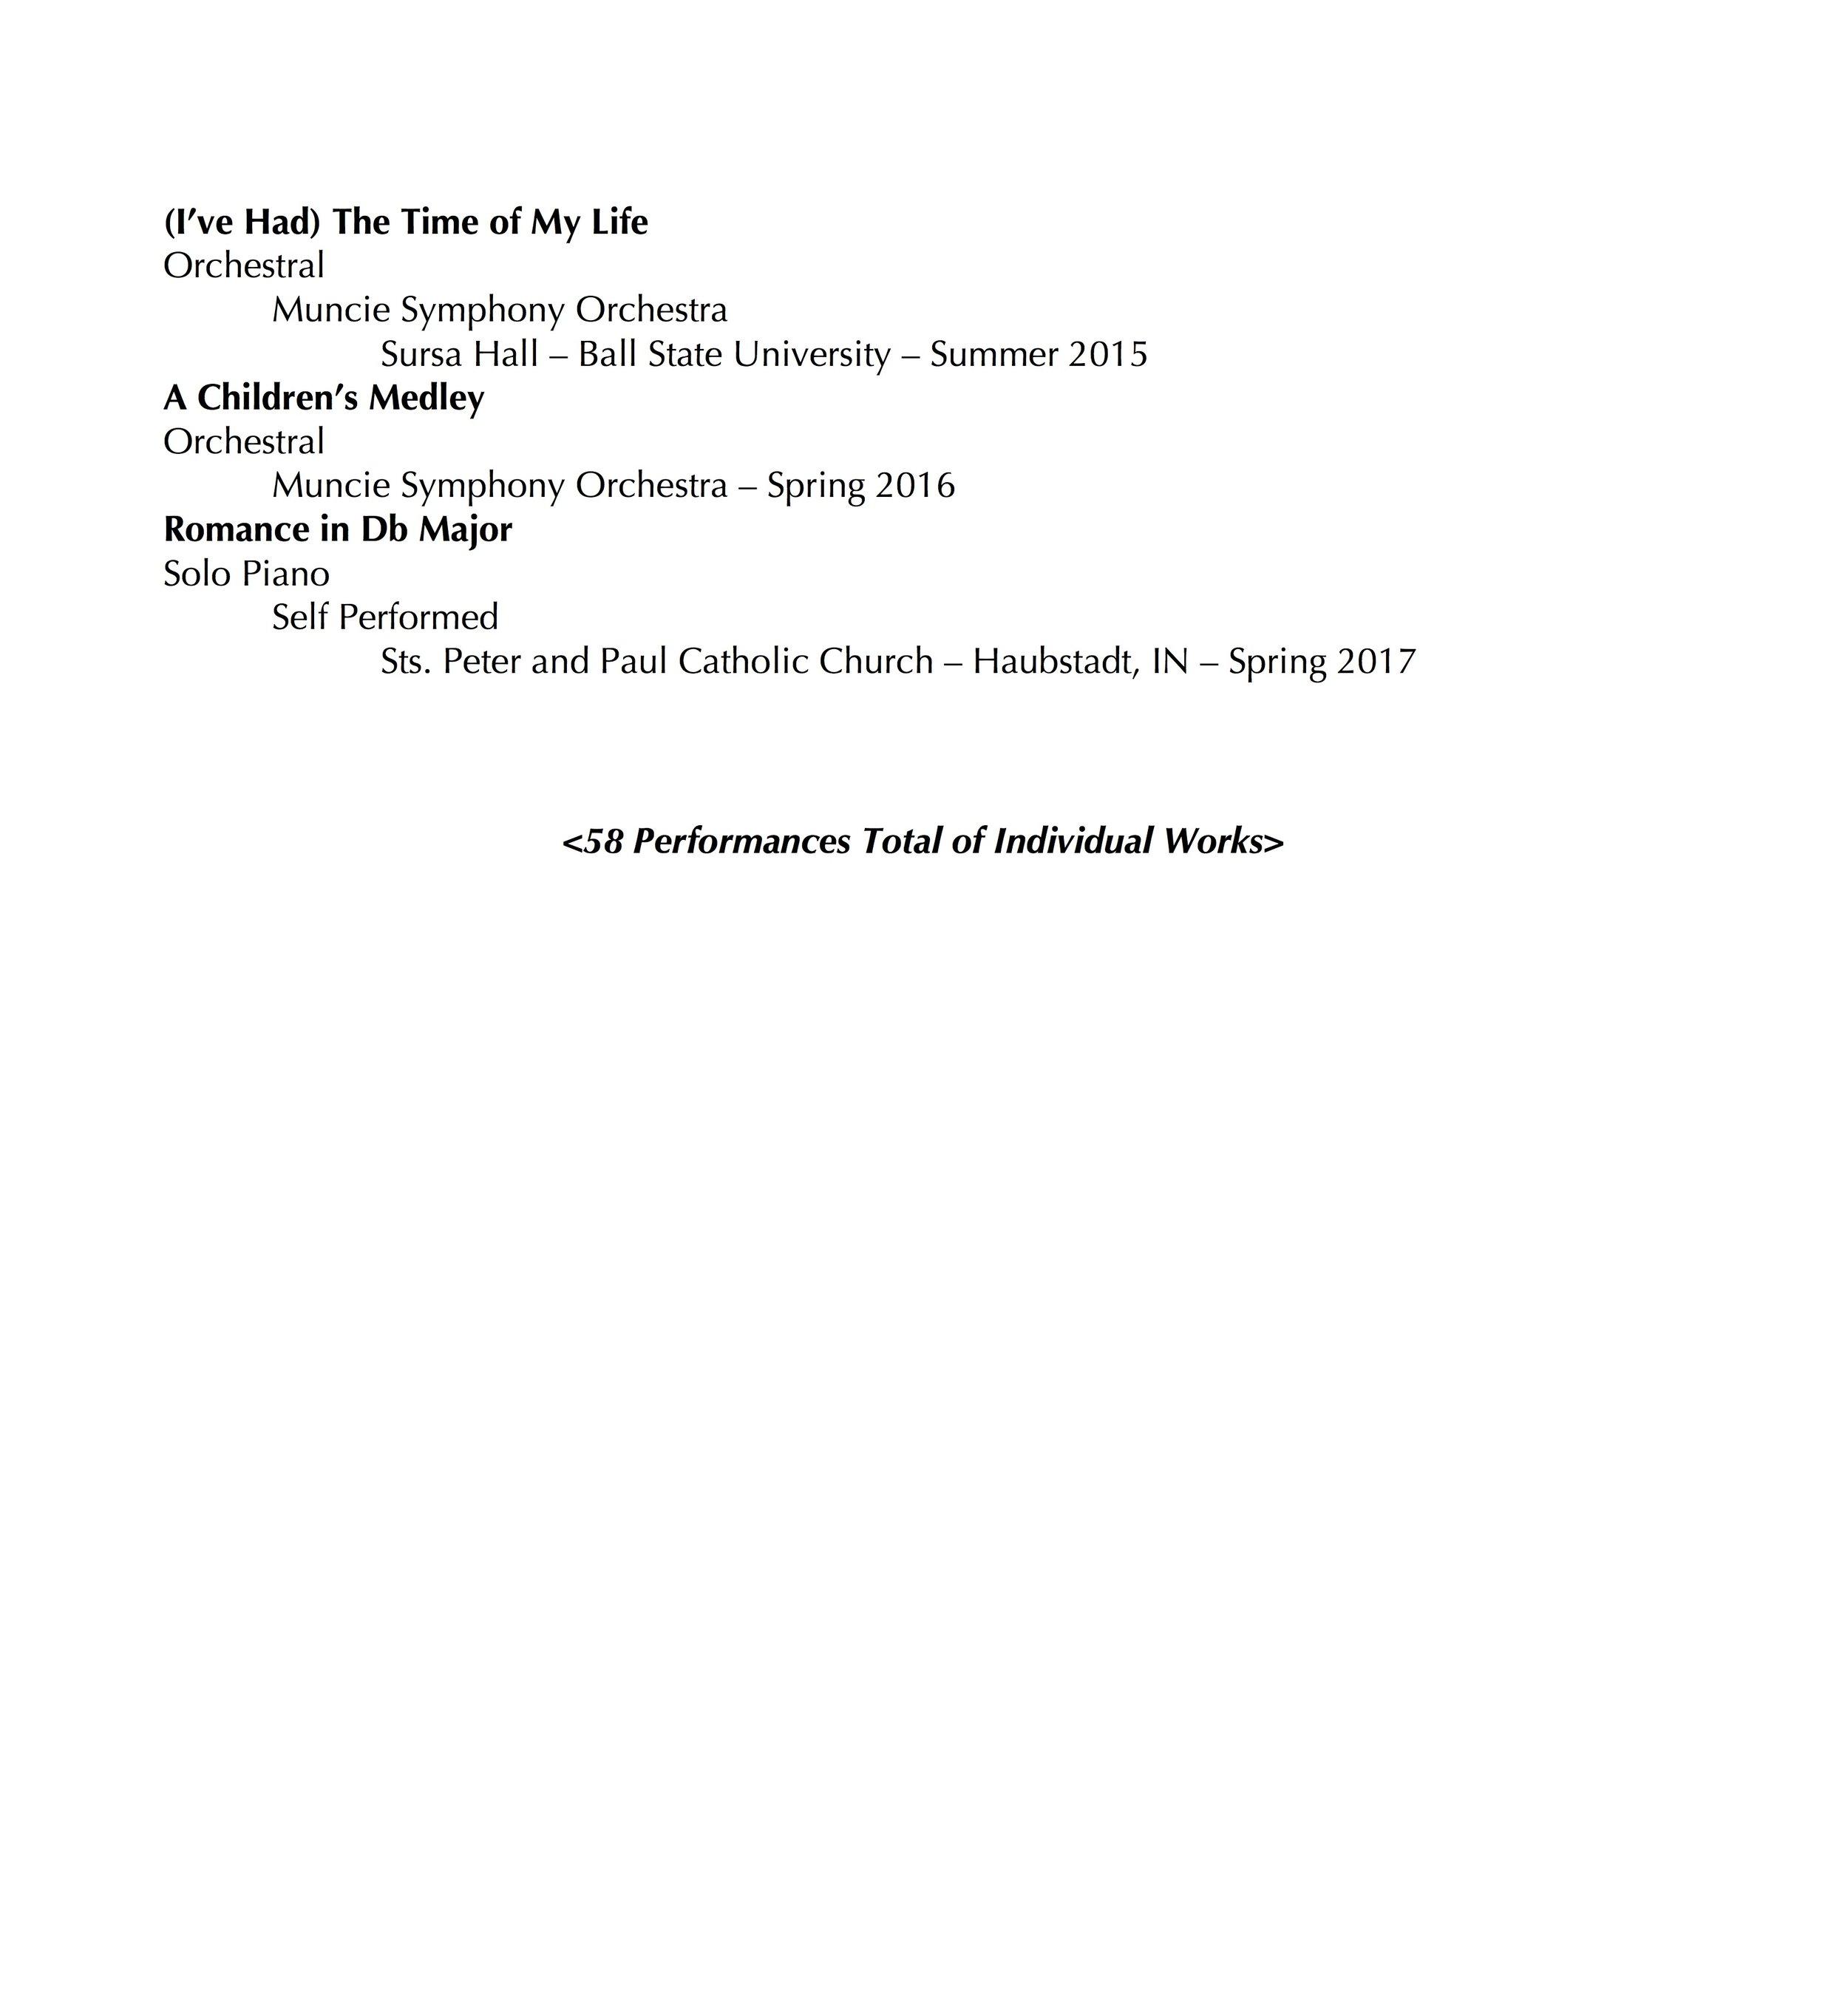 List Of Live Performances (Performed Compositions) Jon D Nelson 8-2-2017 P4.jpg